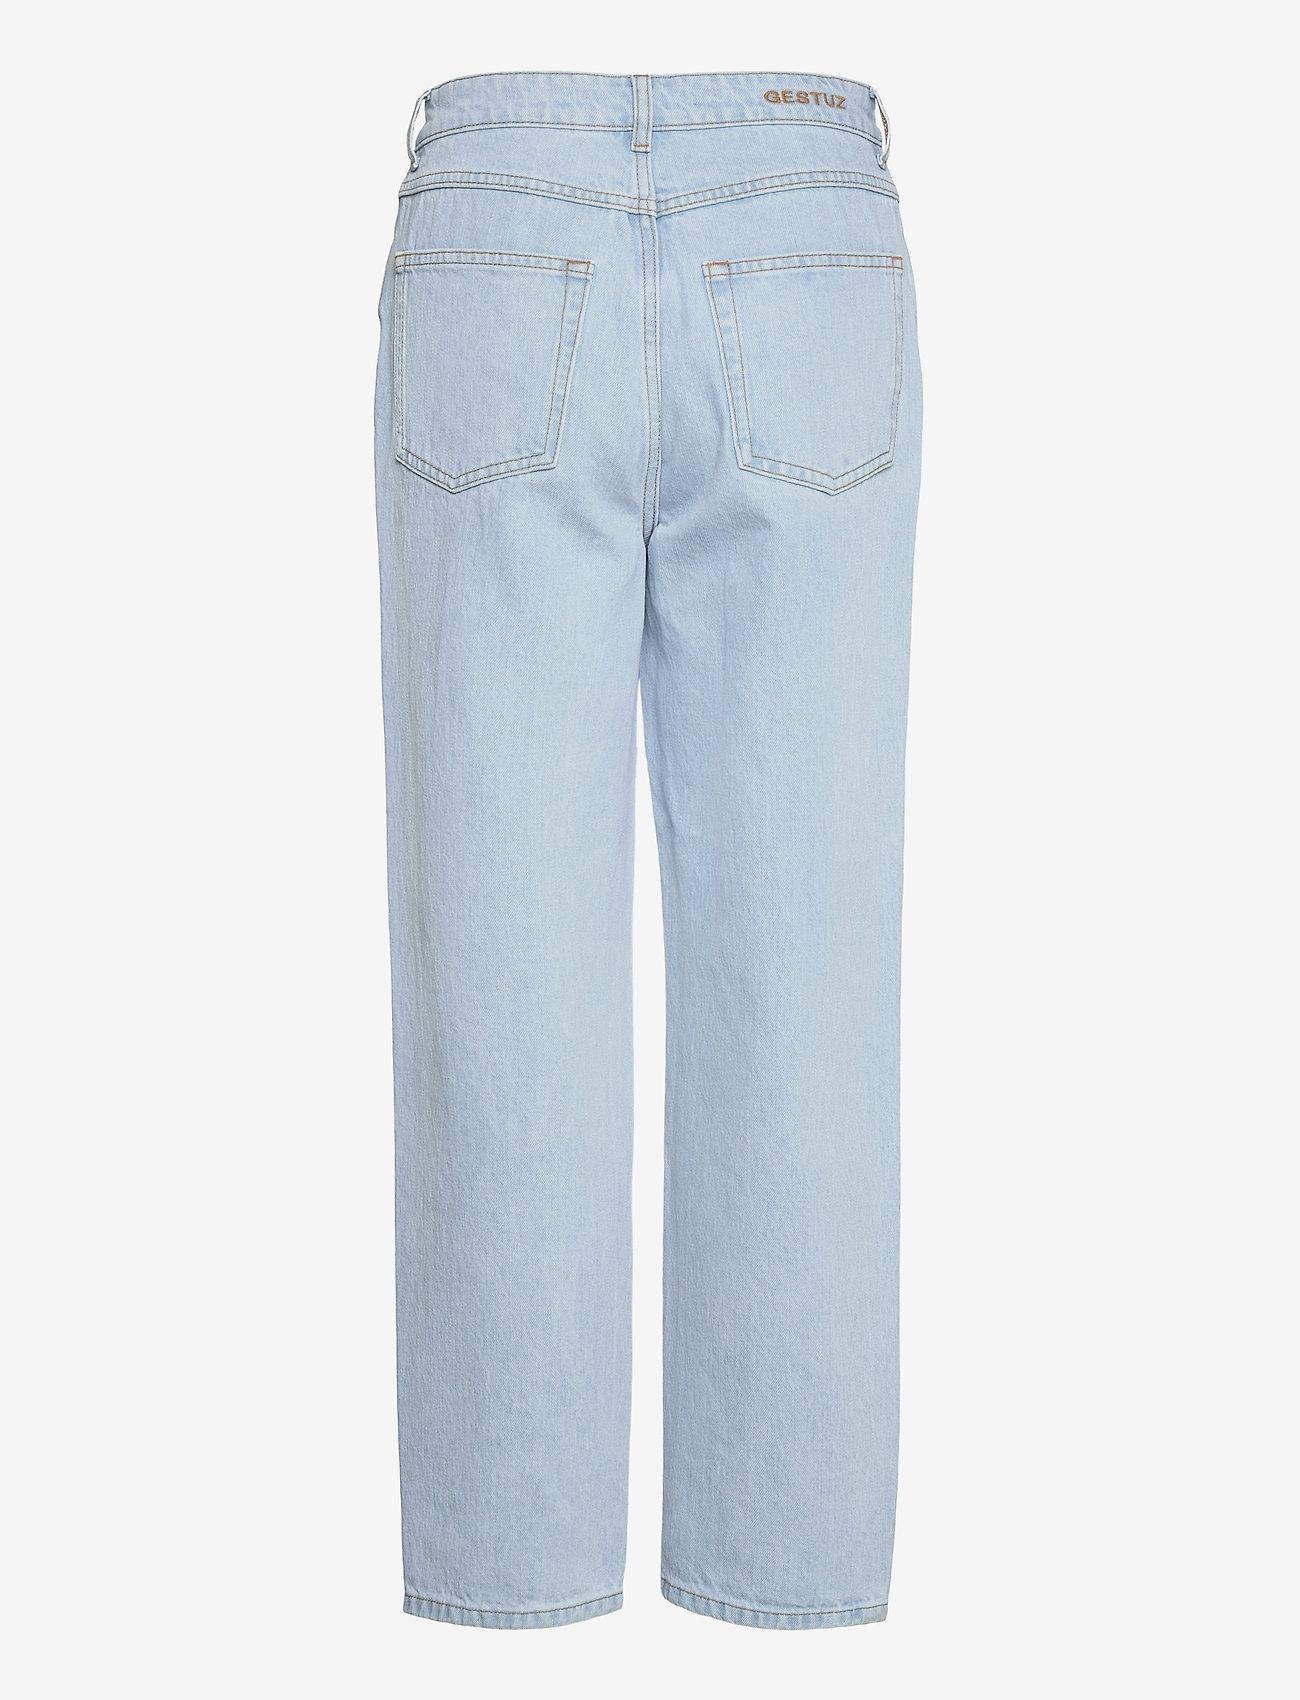 Gestuz - DacyGZ MOM jeans - straight regular - light blue vintage - 2